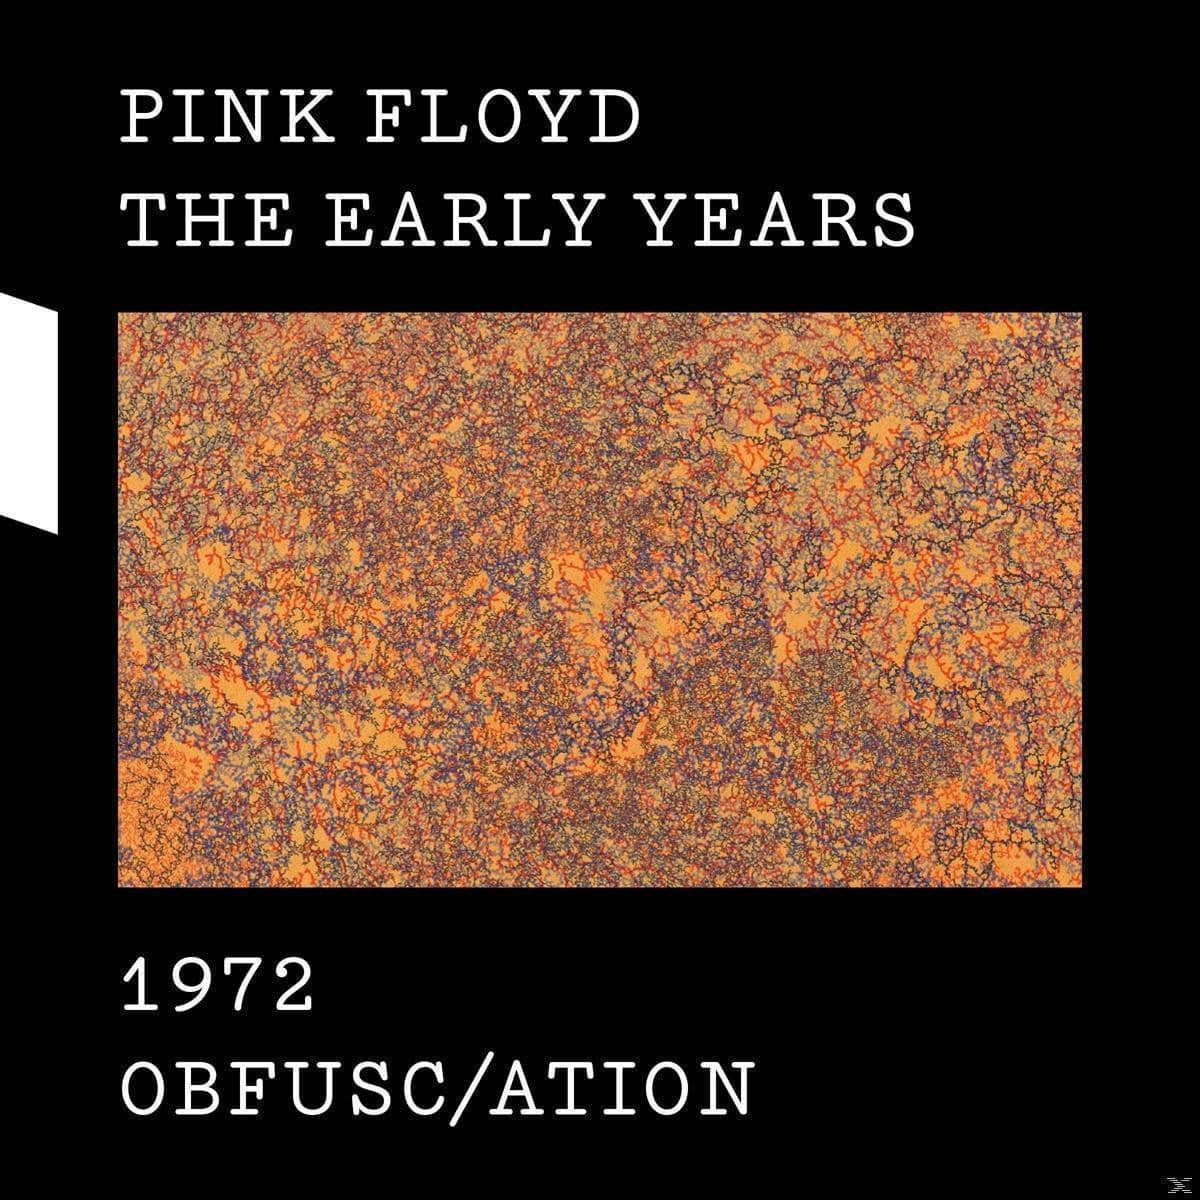 1972 Obfusc. Ation (Pink Floyd) für 46,49 Euro